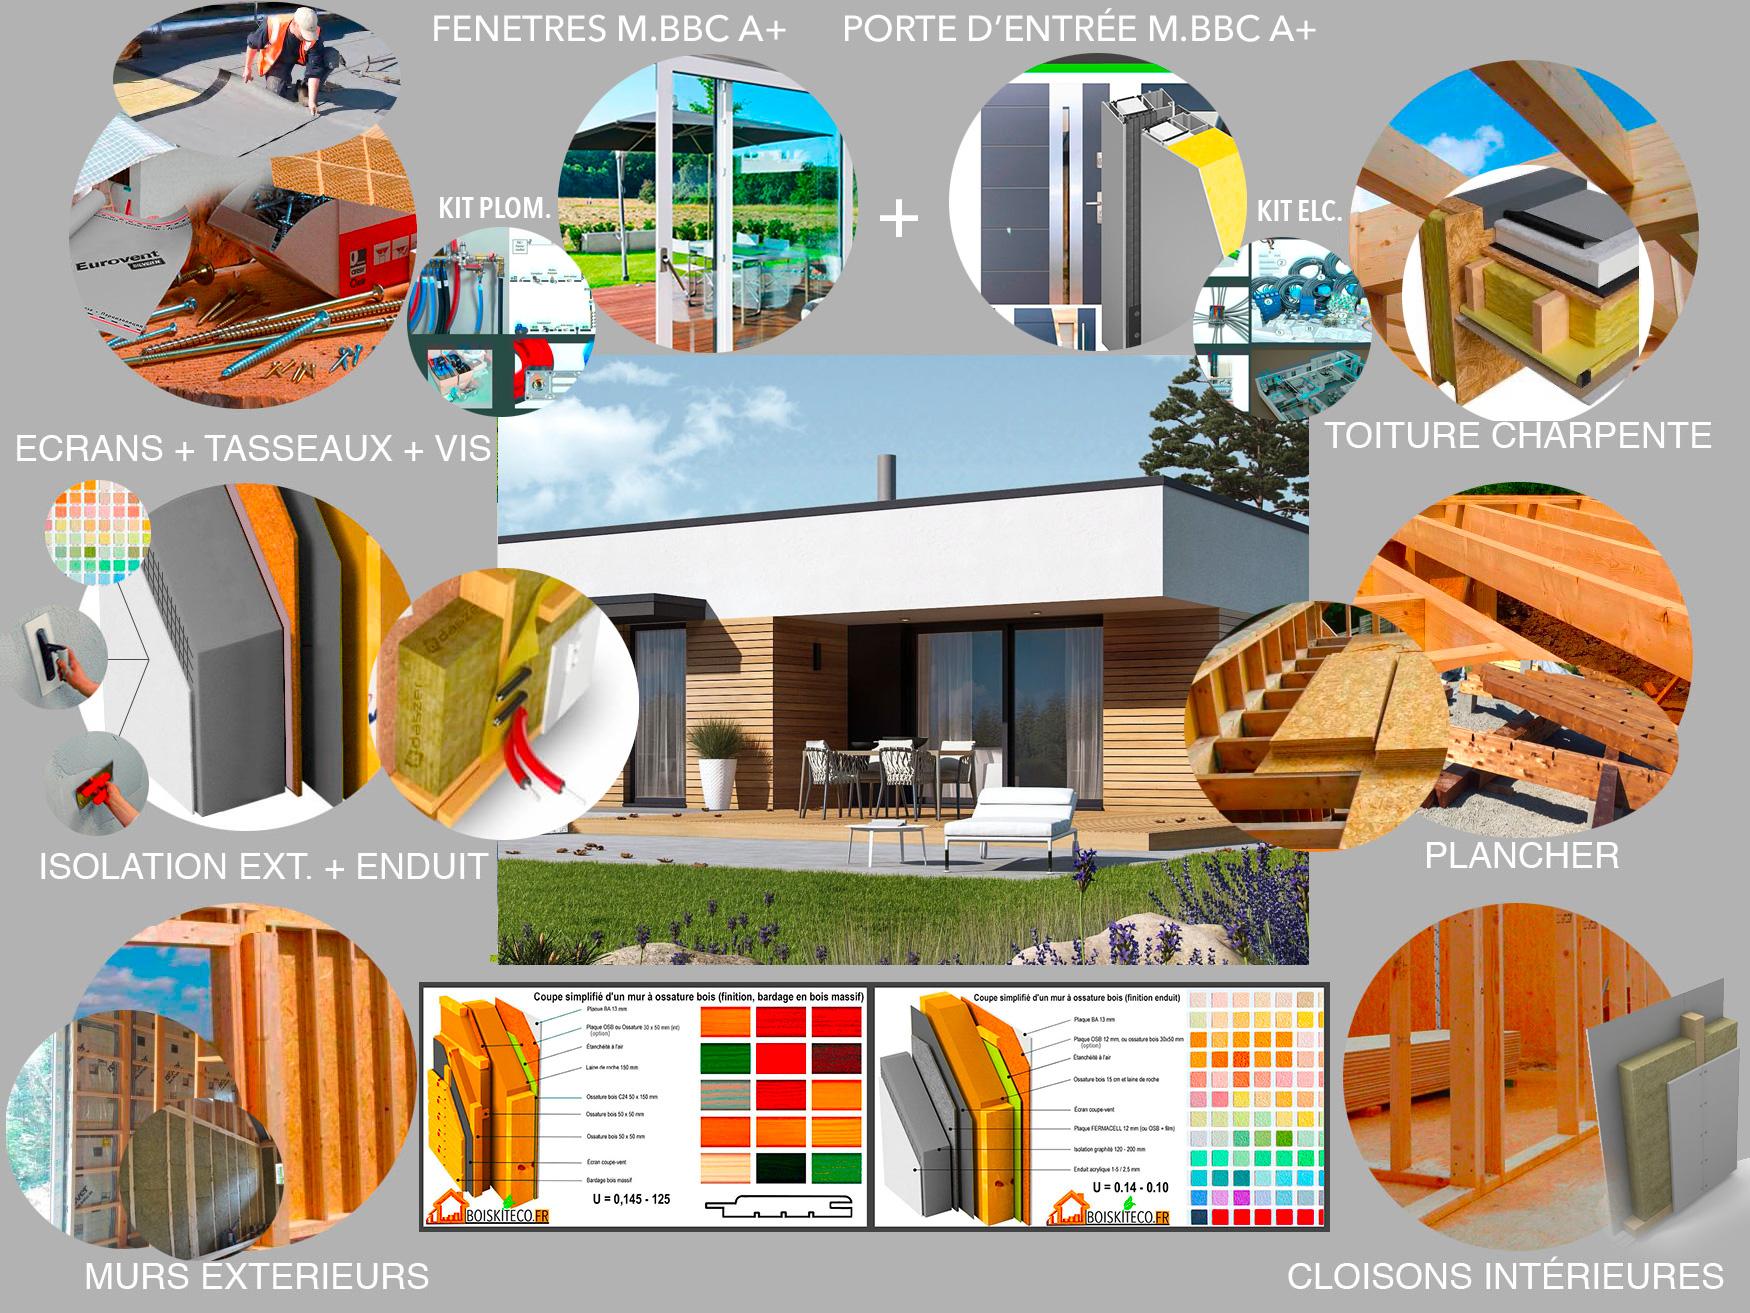 montage kit ossature bois MAISON MINI 1 MODERN ENERGO